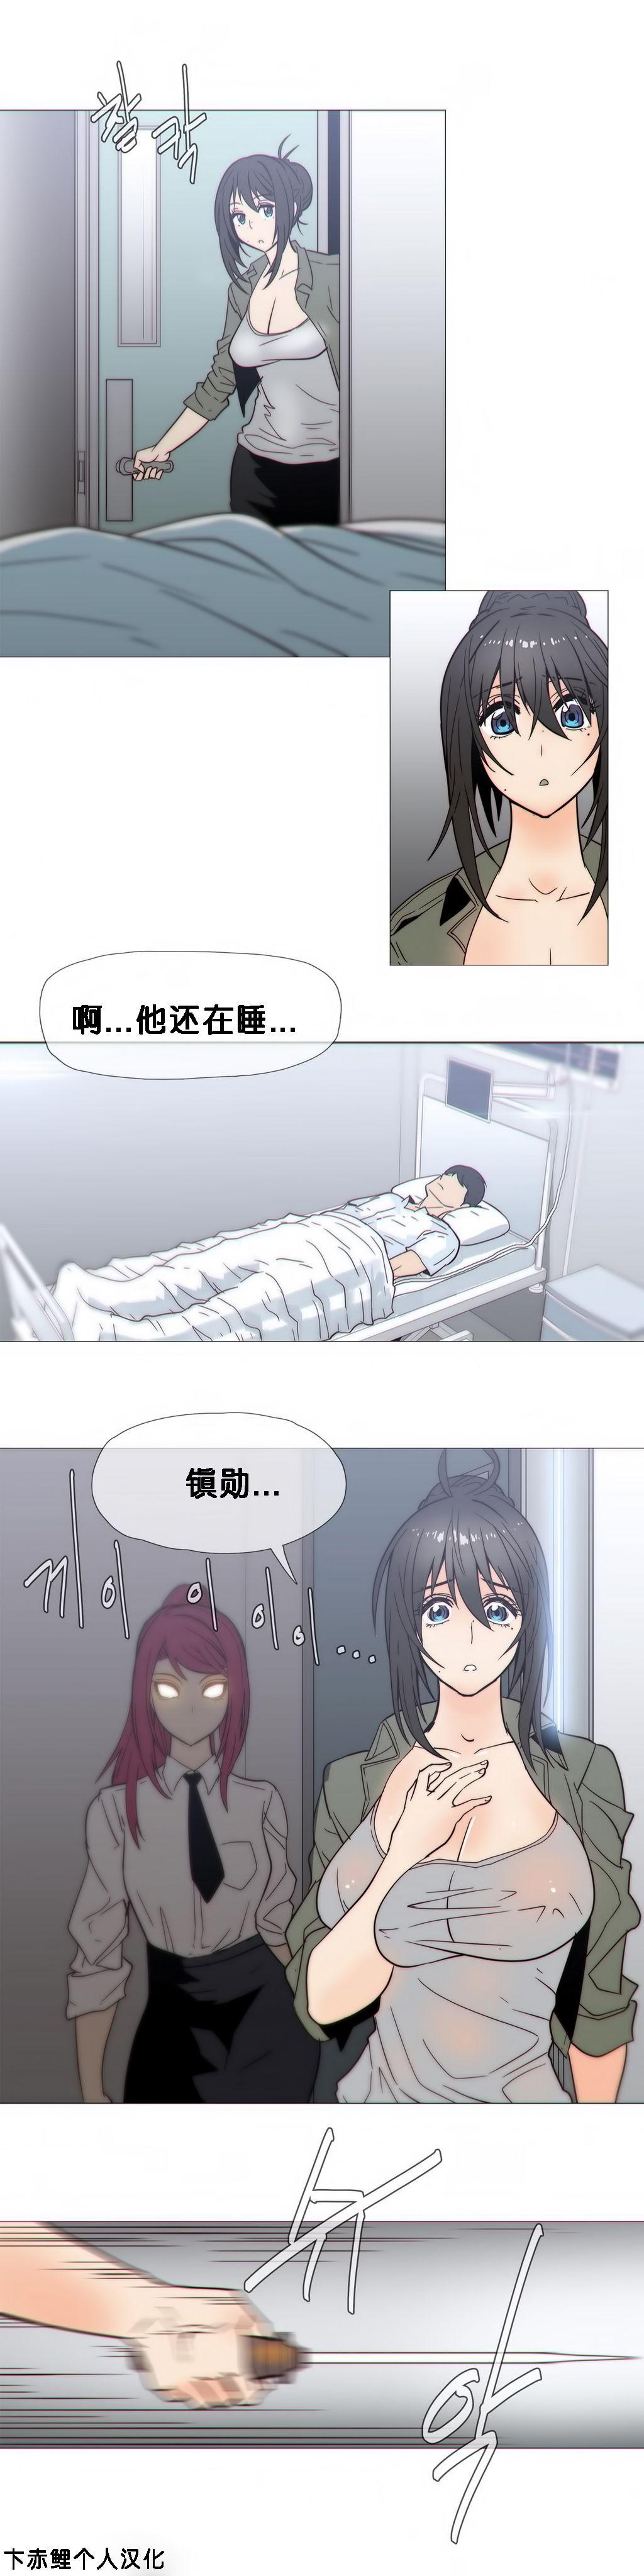 HouseHold Affairs 【卞赤鲤个人汉化】1~33话(持续更新中) 490